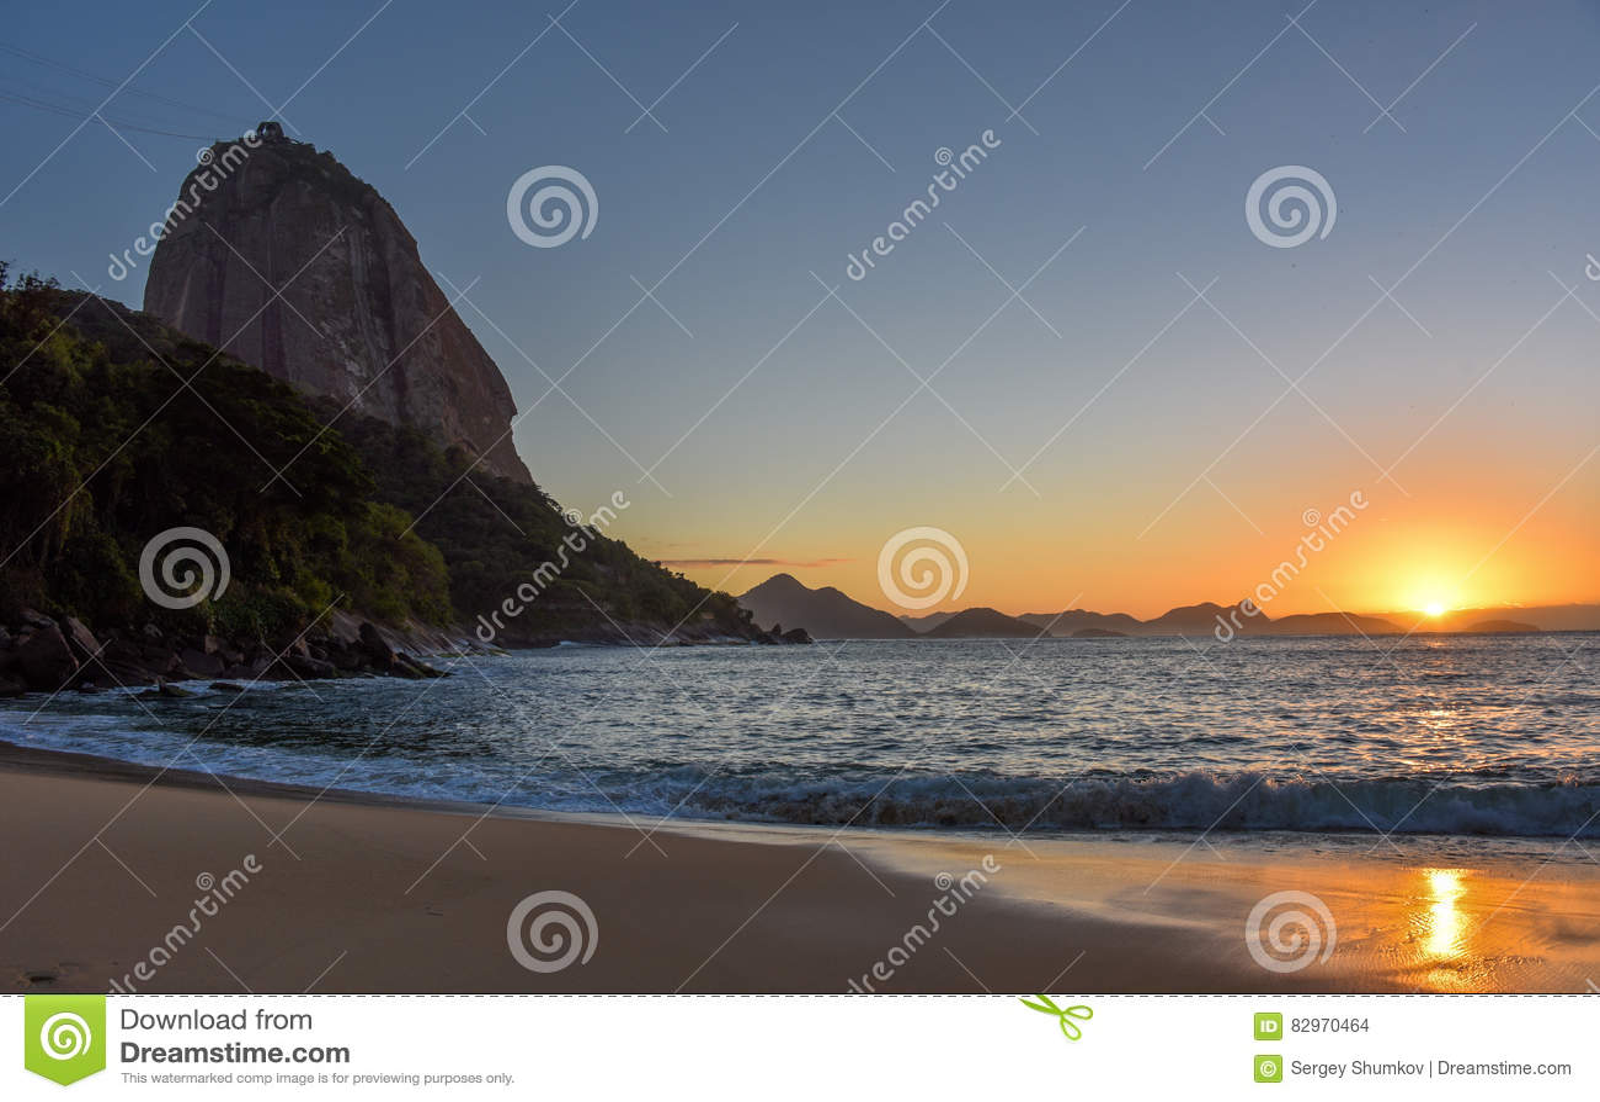 Mooie zonsopgang bij Praia Vermelha en de Sugarloaf-Berg